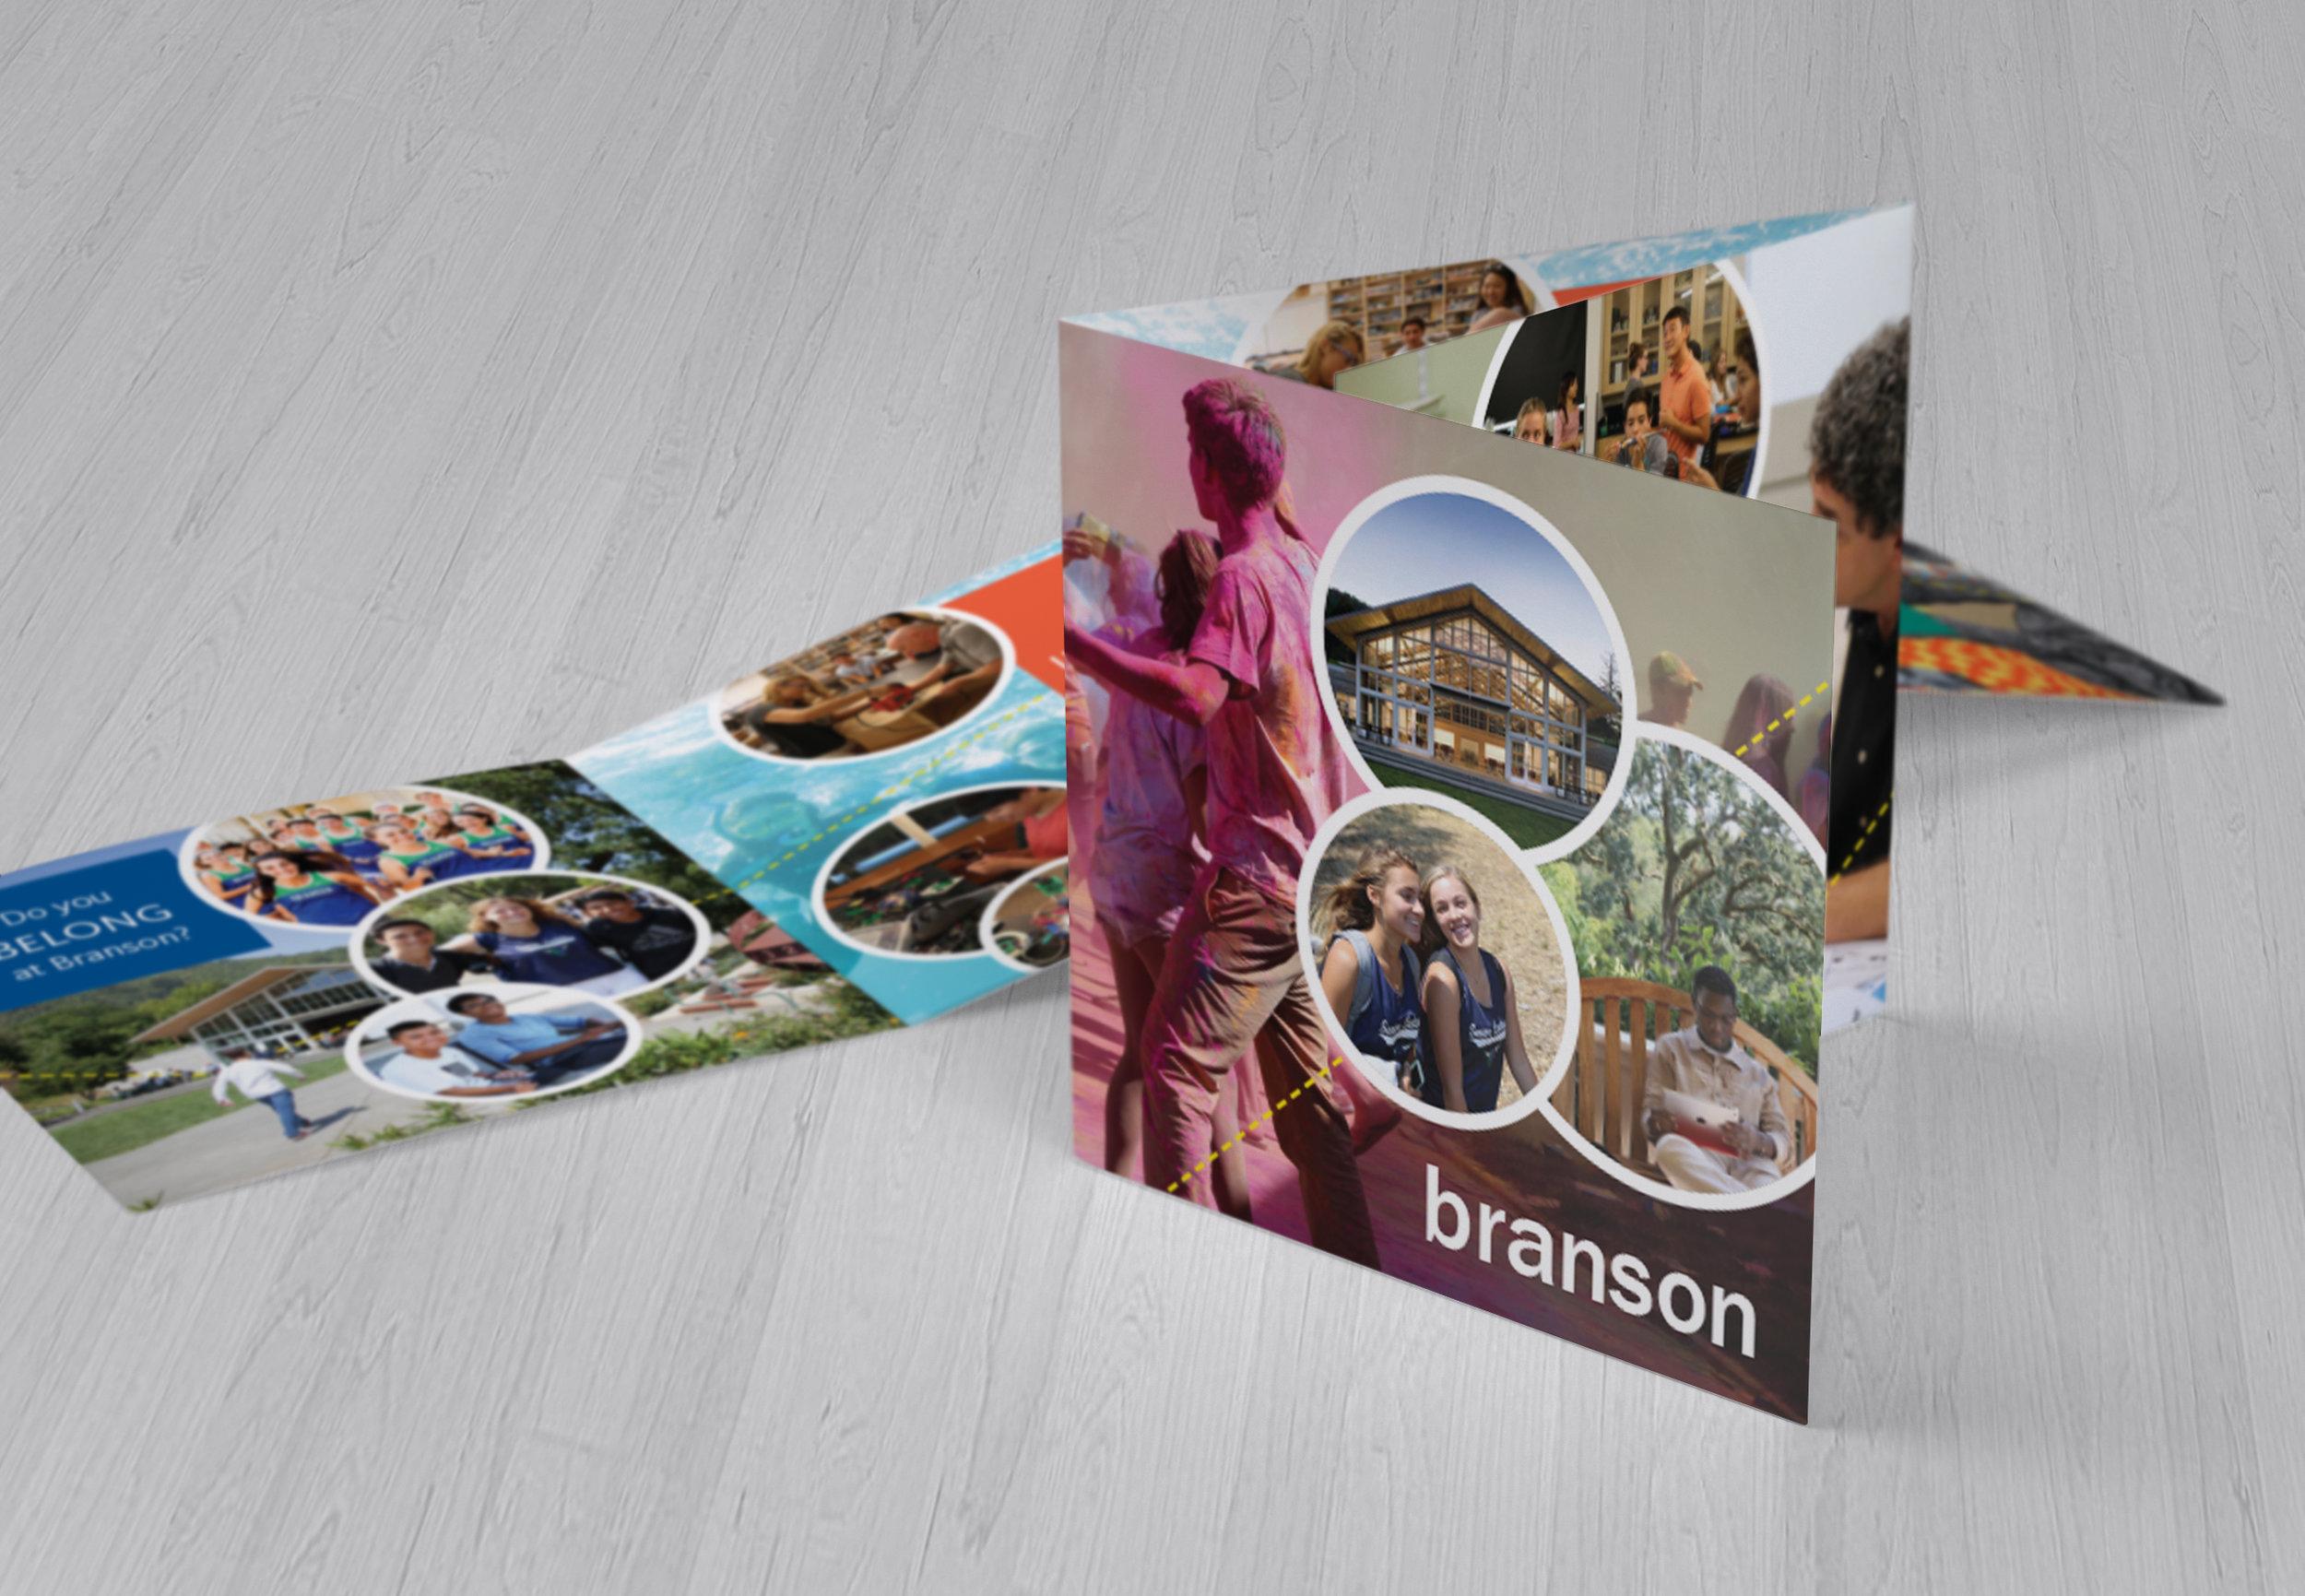 Copy of Branson_Mockup_Marketing Teaser_11292016_v3.jpg